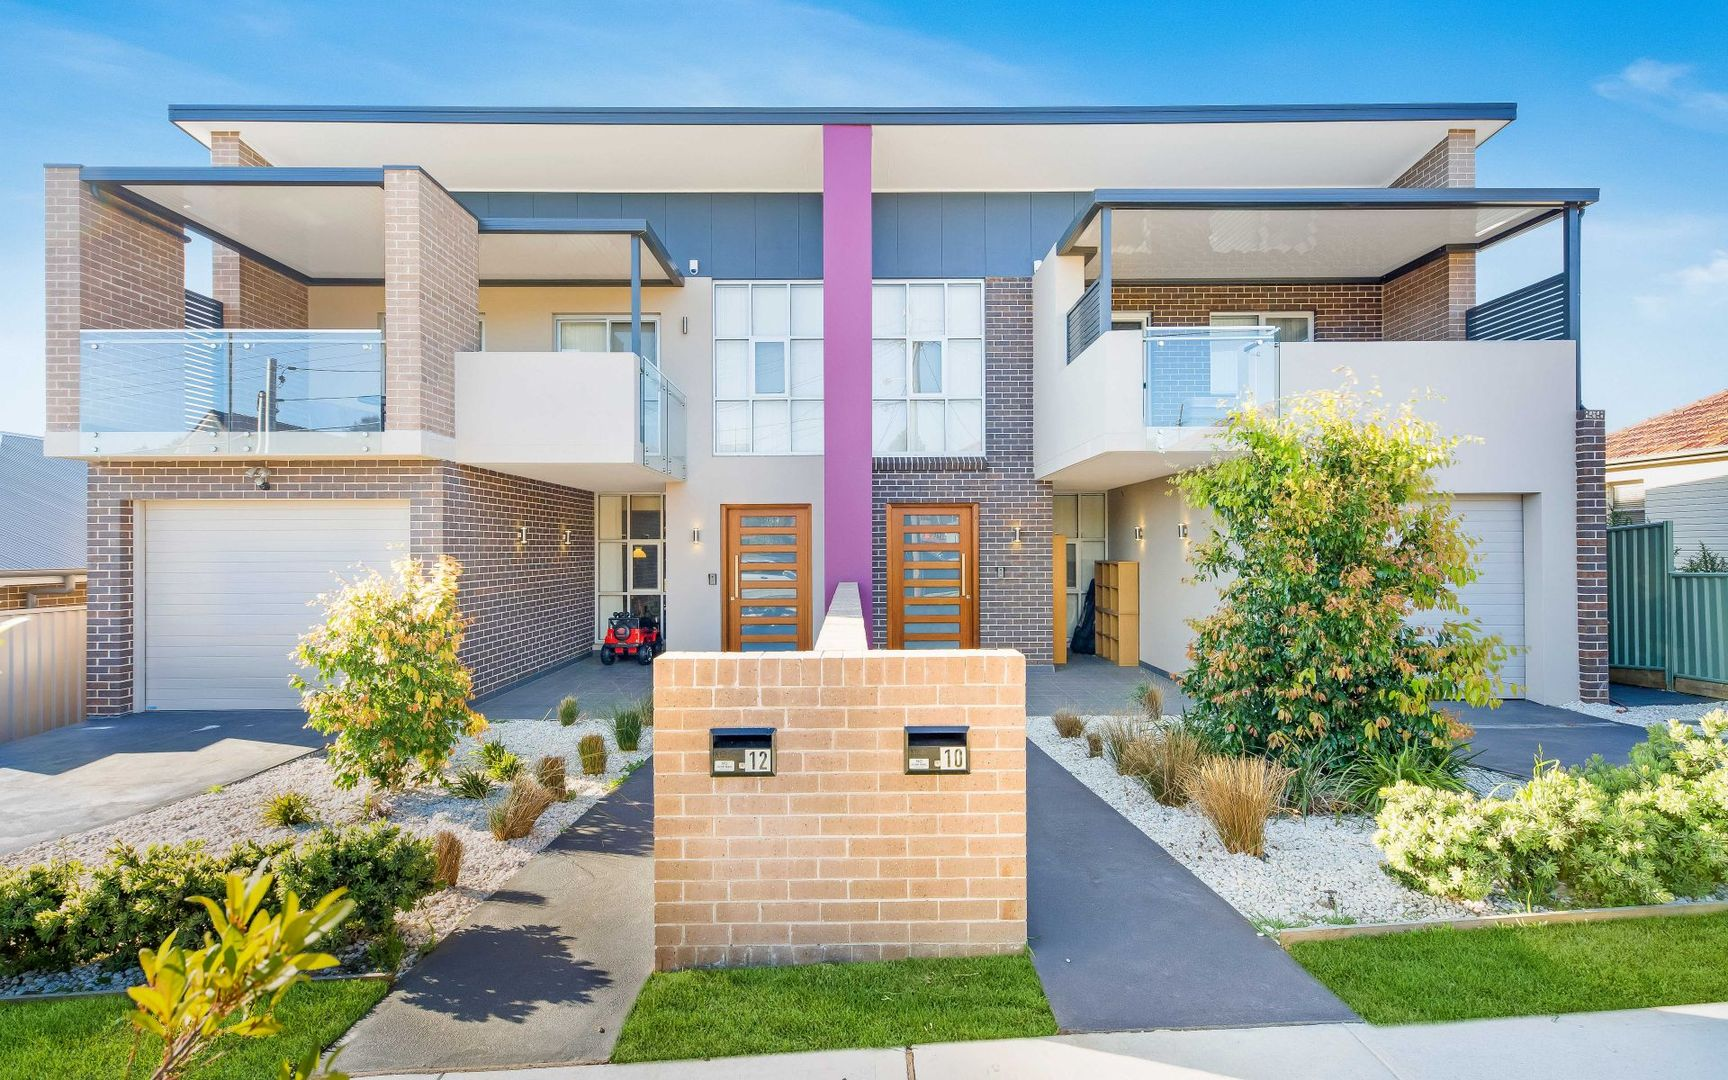 12 Bungalow Rd, Peakhurst NSW 2210, Image 0